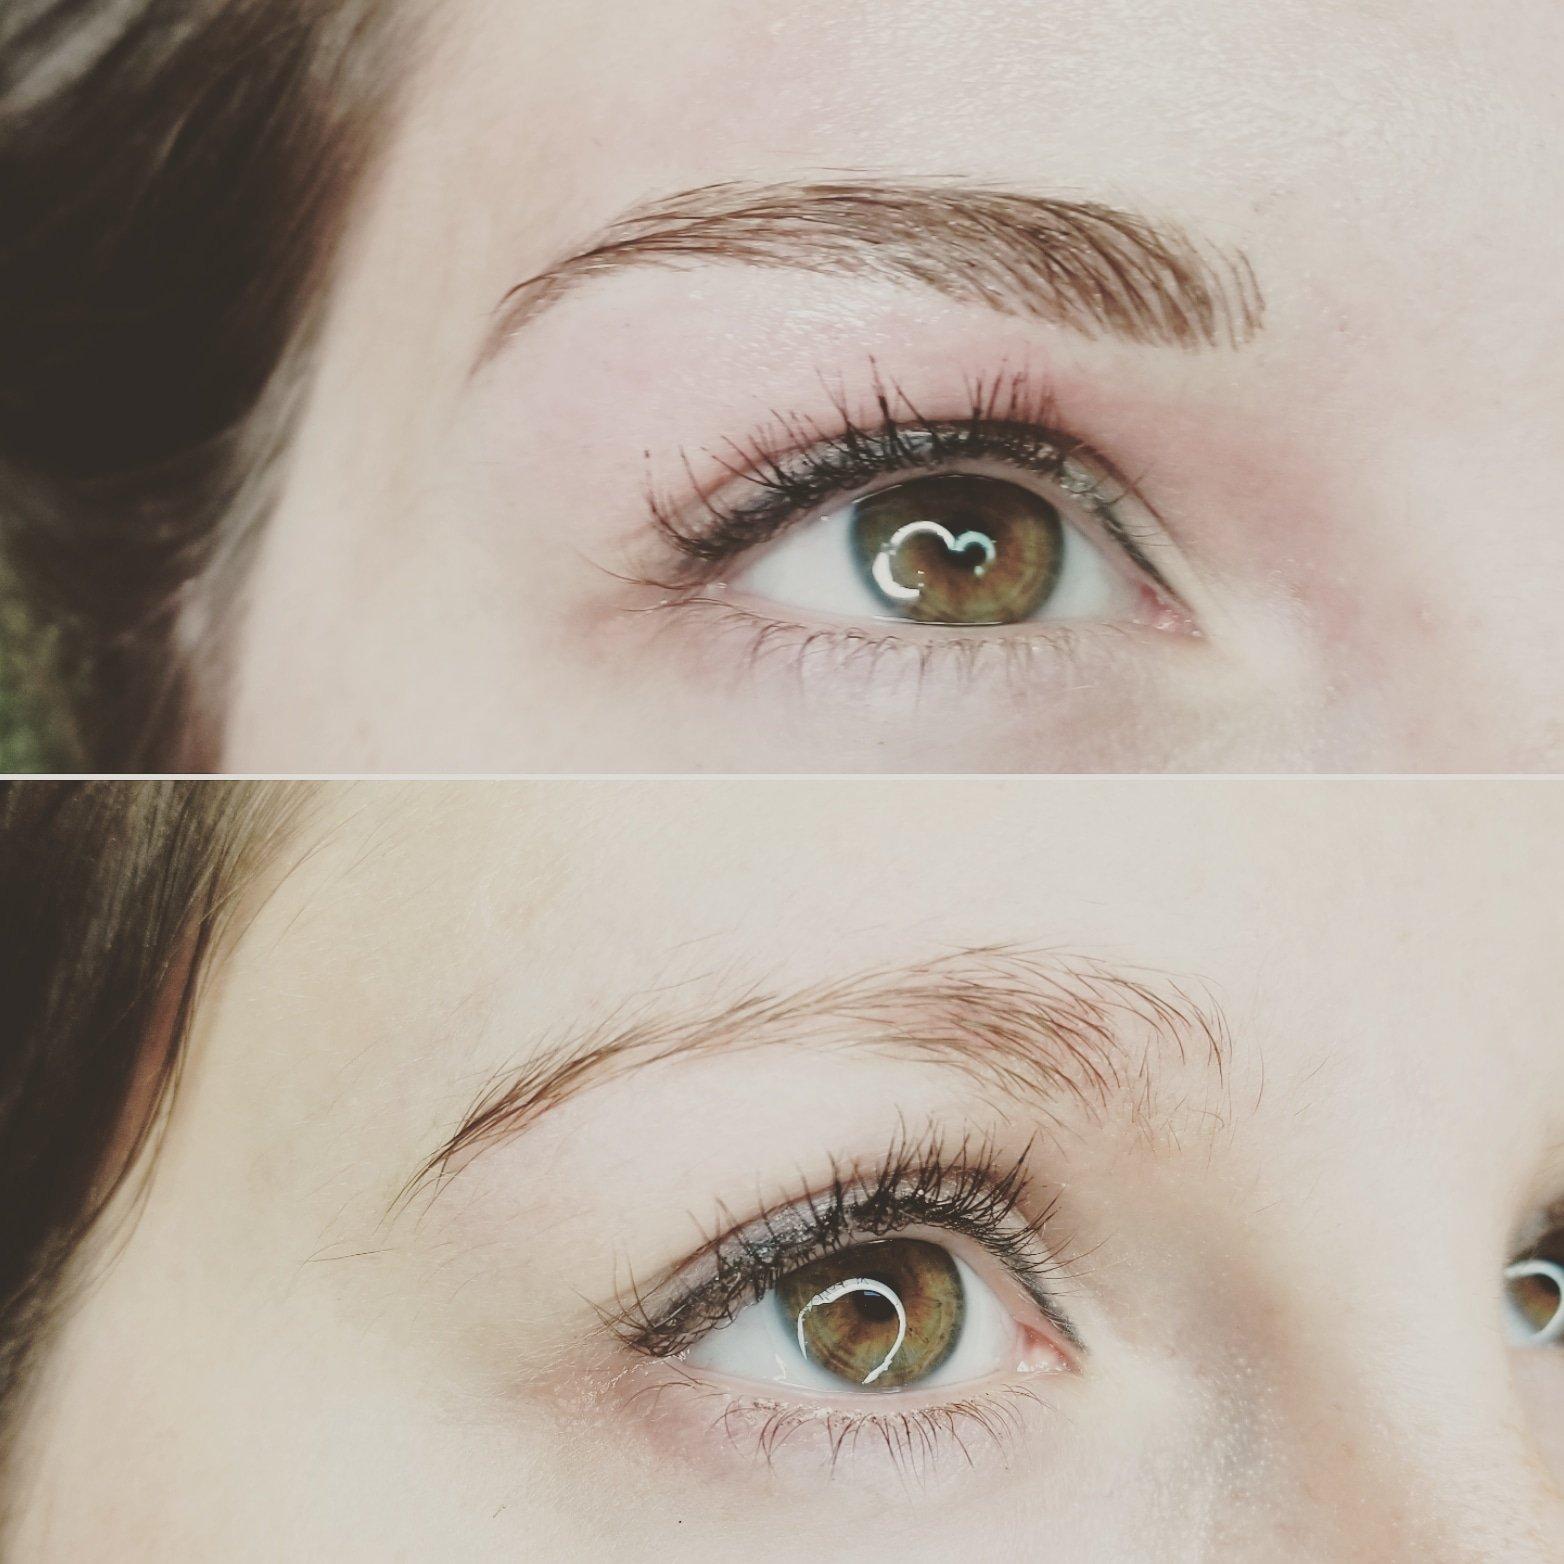 Envy brows N lashes image 9